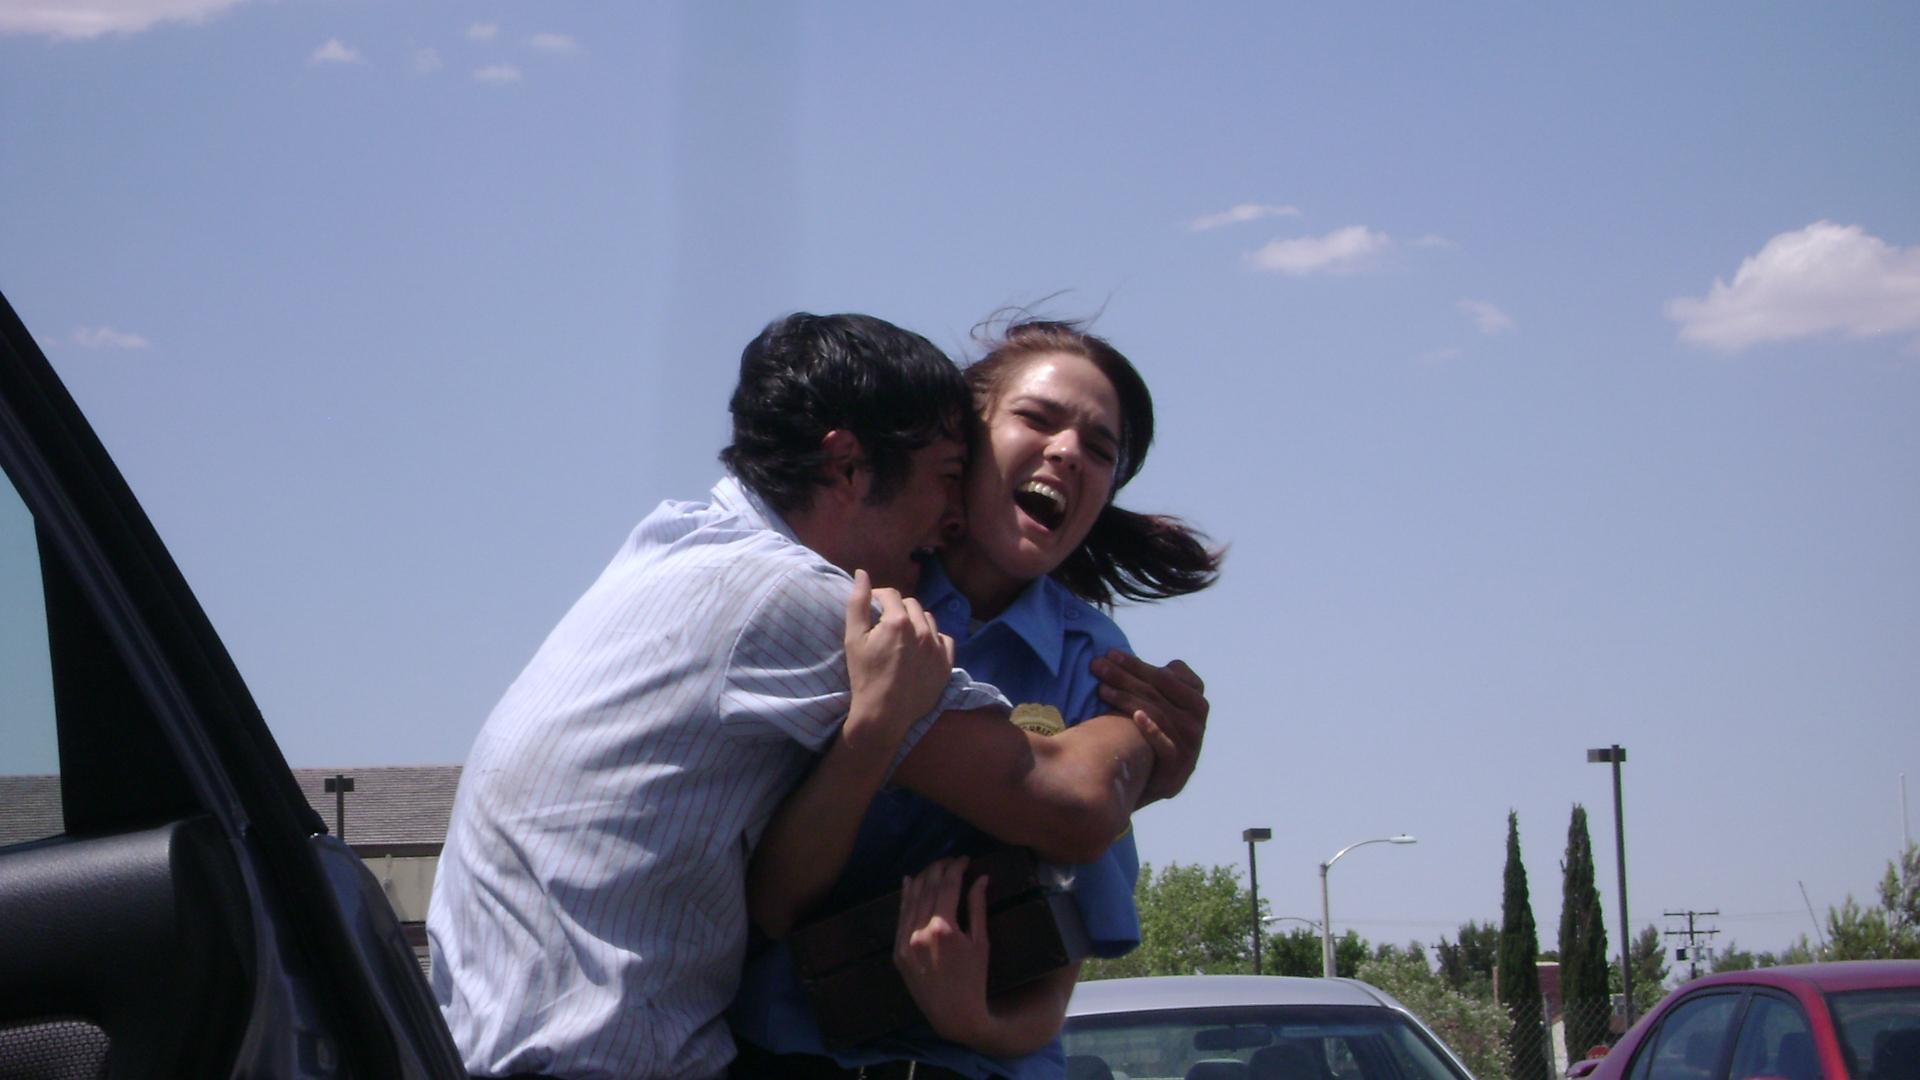 Attack of the Yeti Hand  - B-movie comedy |  @ IMDB.com